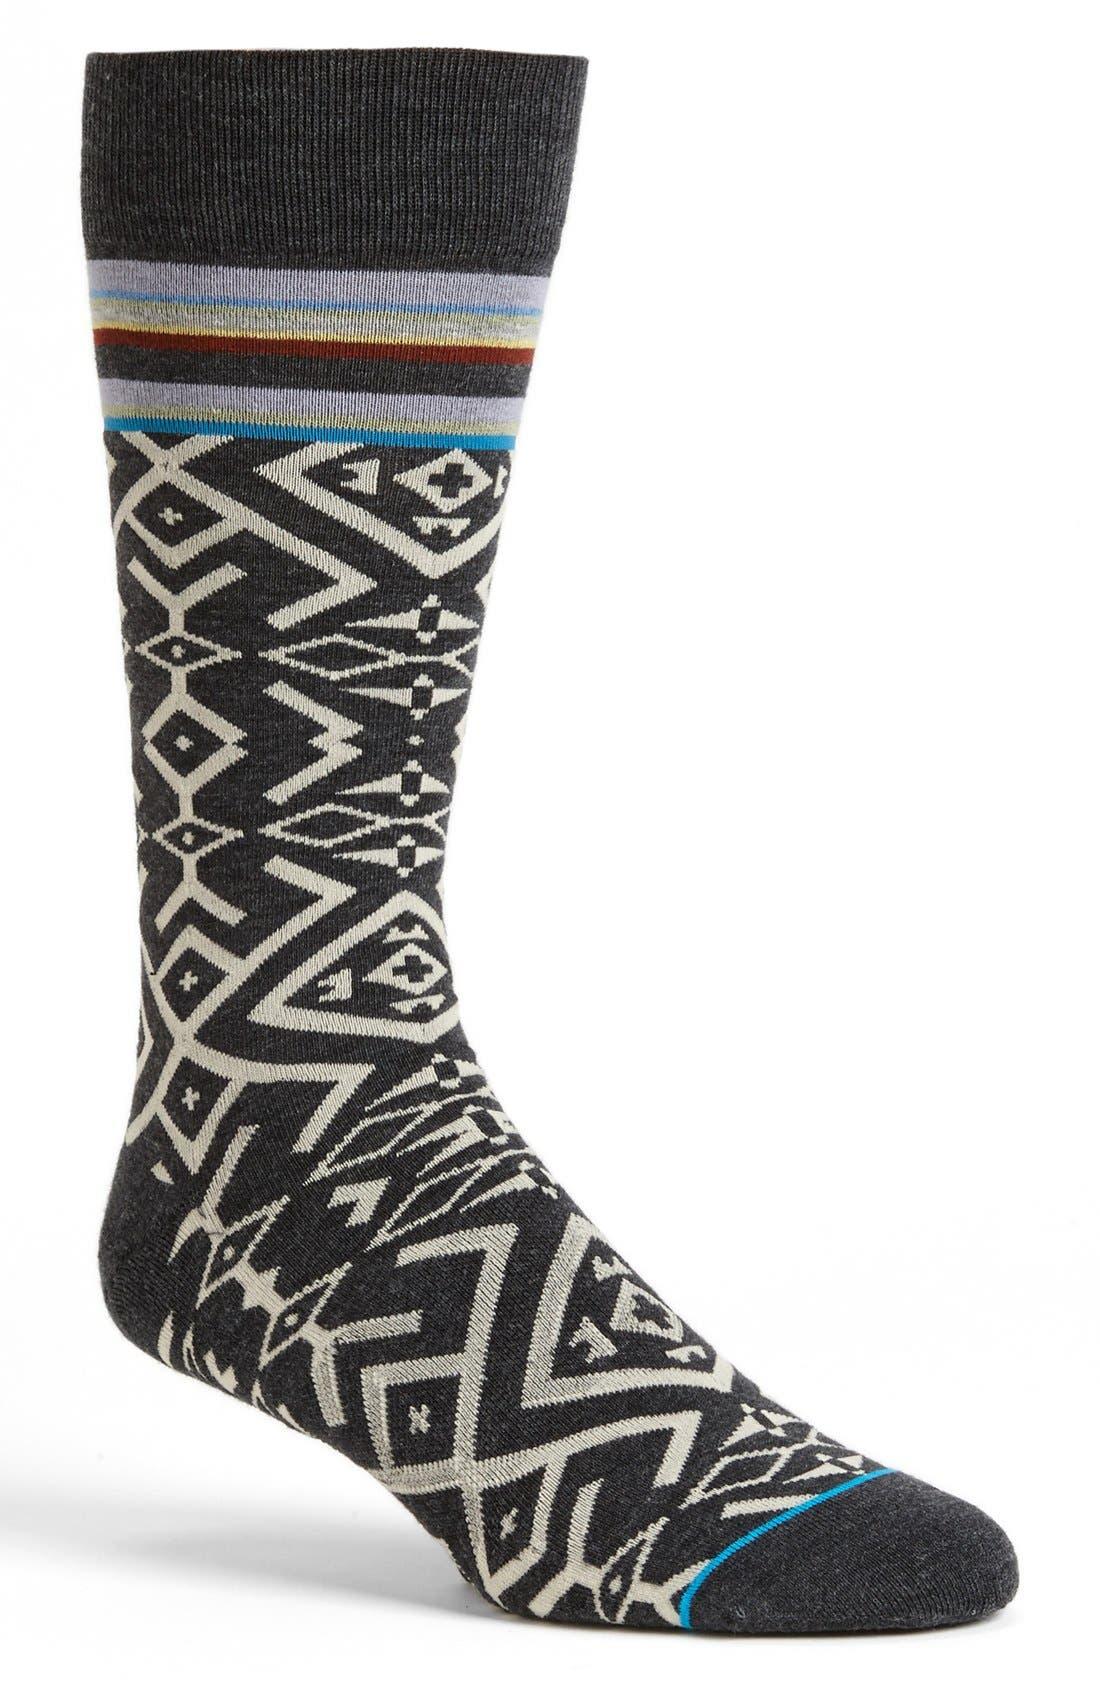 Main Image - Stance 'Casablanca' Socks